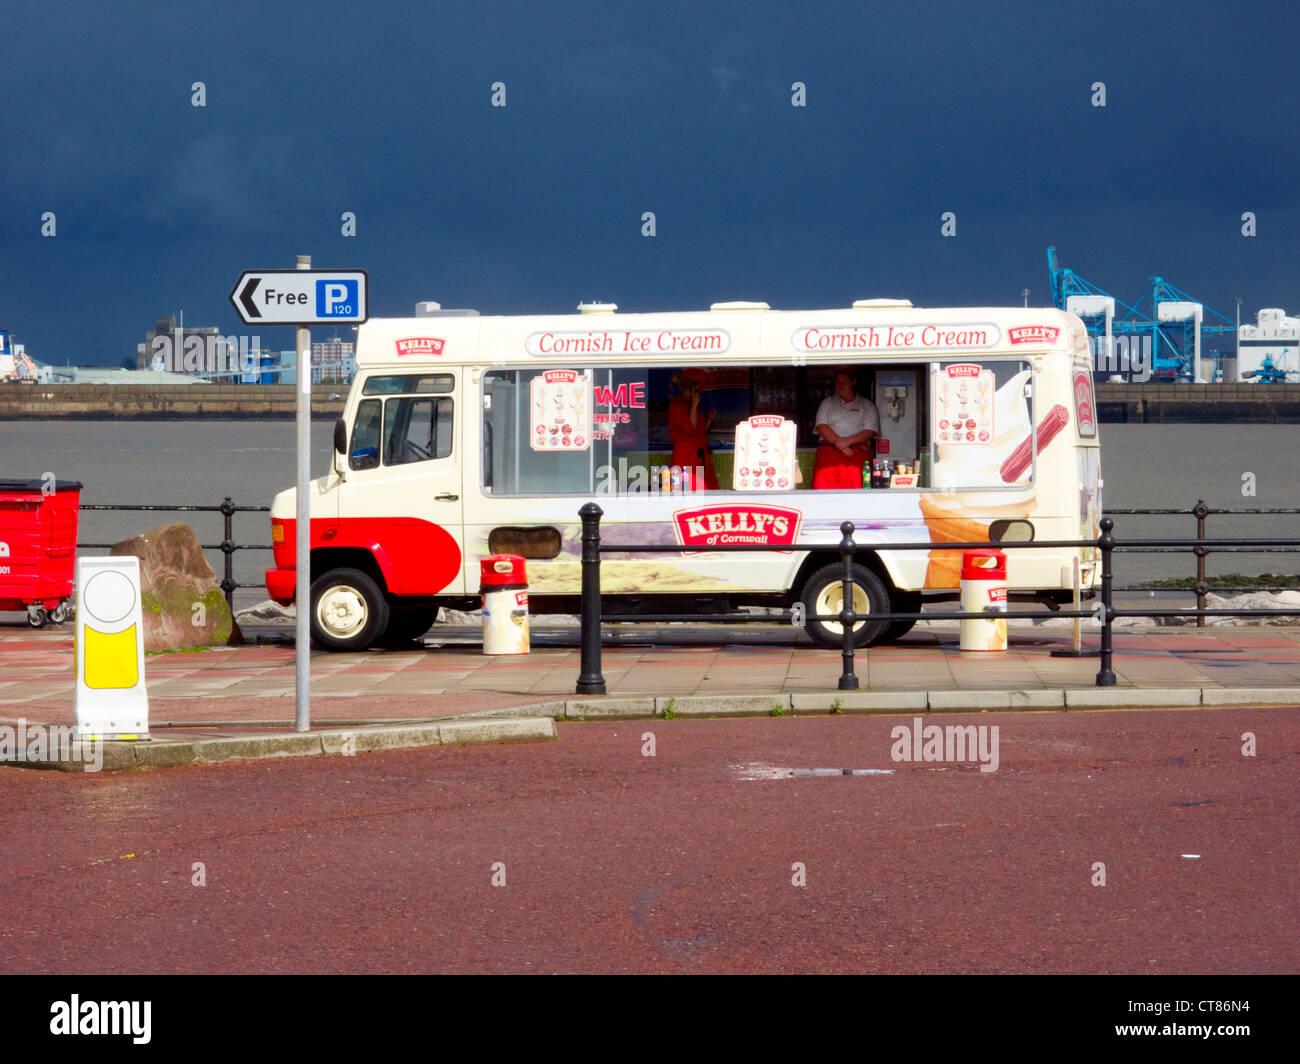 New Brighton, end of season. Sept 2011. Merseyside seaside resort.  Ice cream van parked by River Mersey, industry - Stock Image